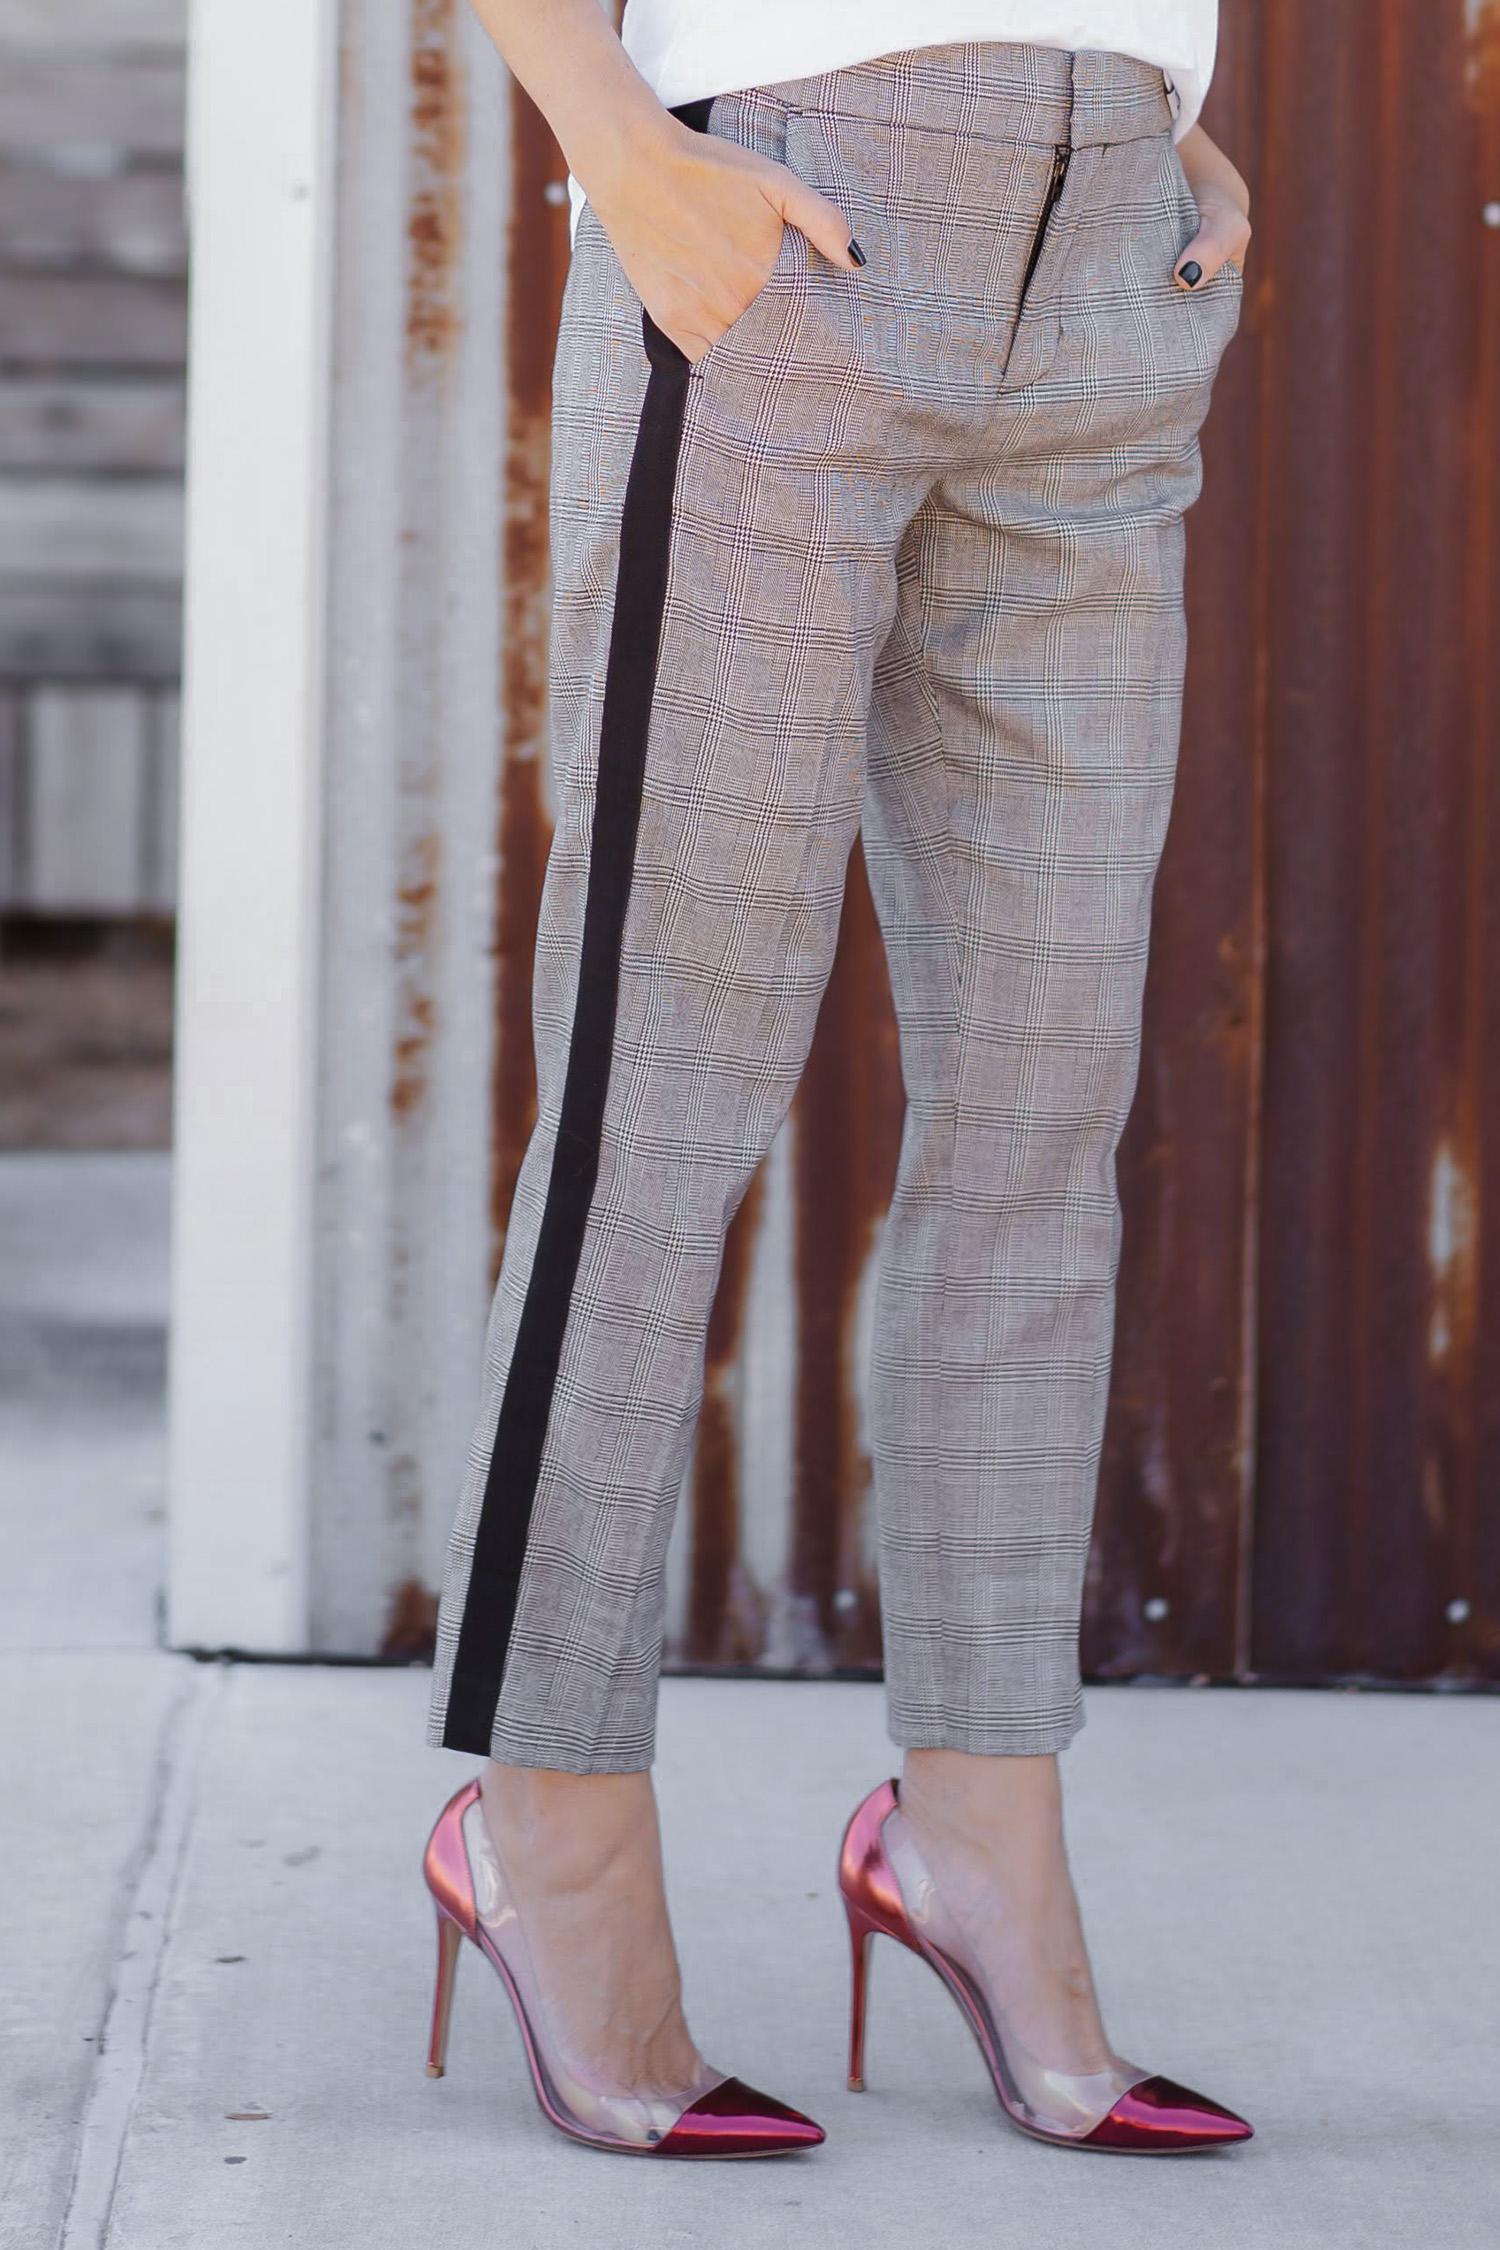 Styling Plaid Pants